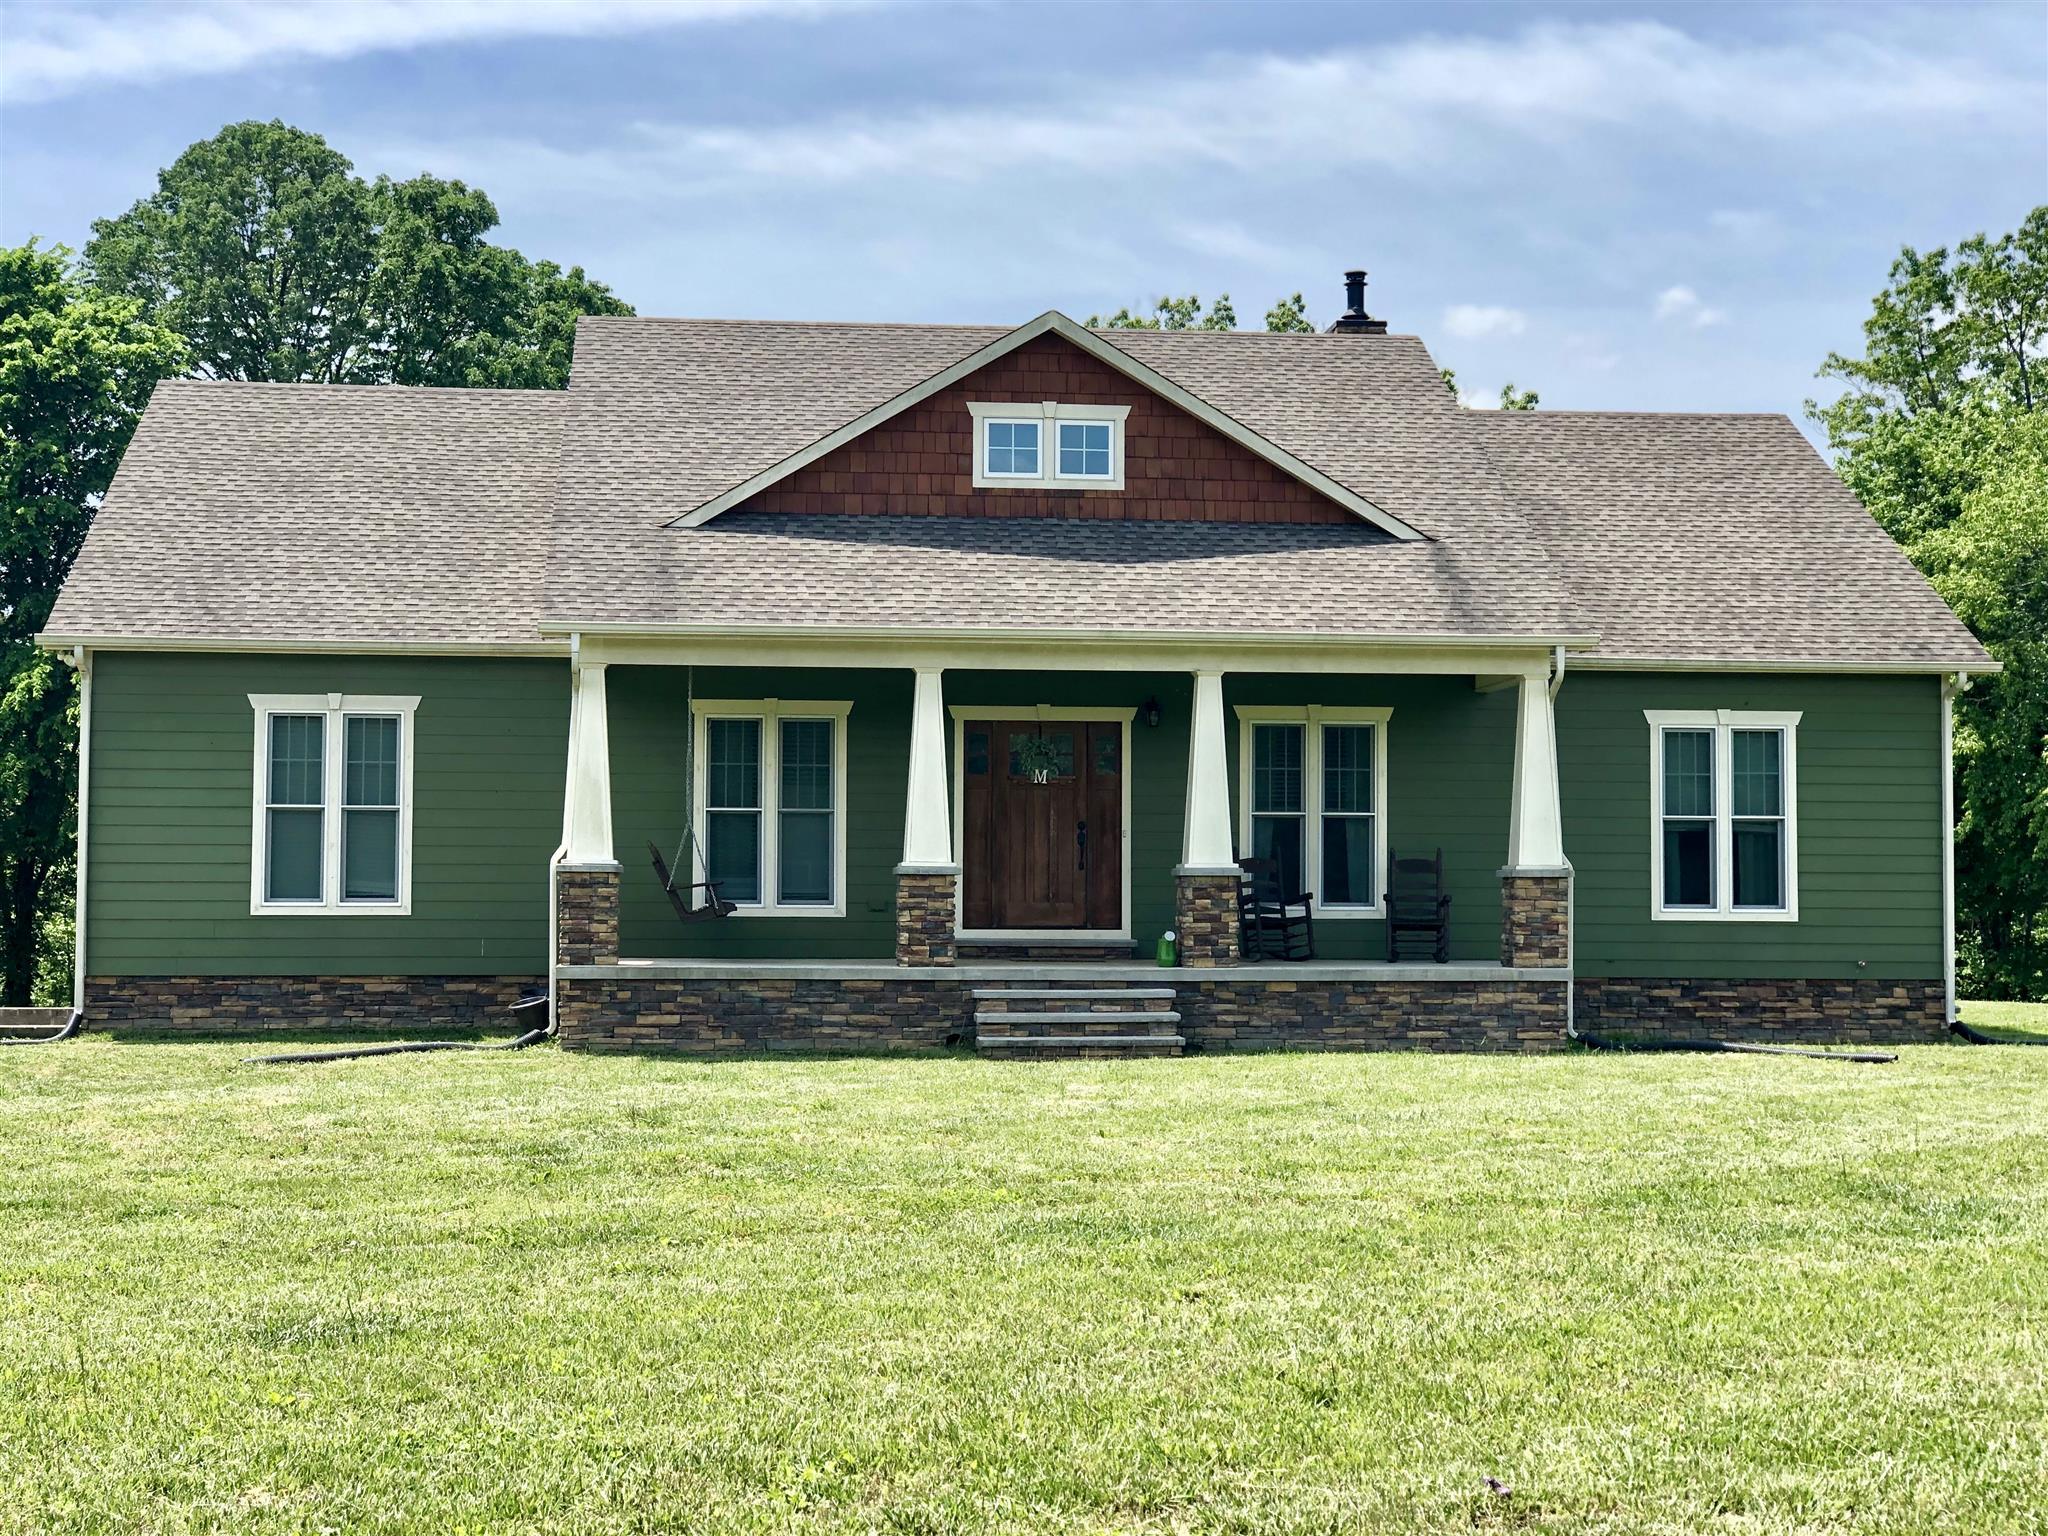 5155 Cookeville Hwy, Smithville, TN 37166 - Smithville, TN real estate listing